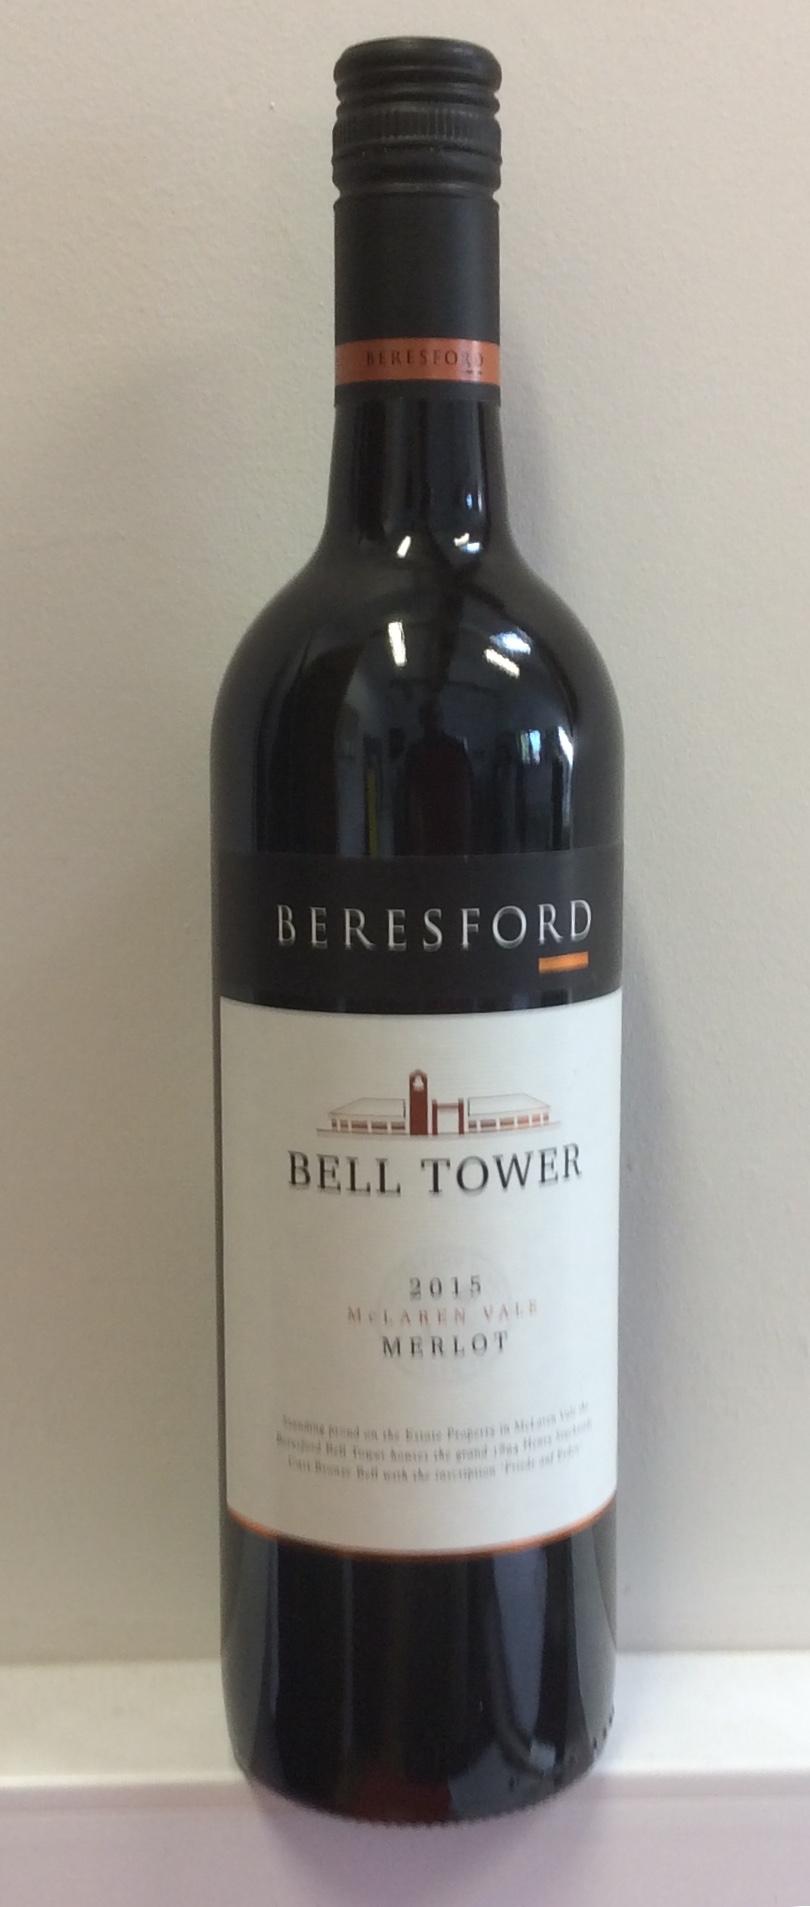 Beresford Bell Tower Merlot